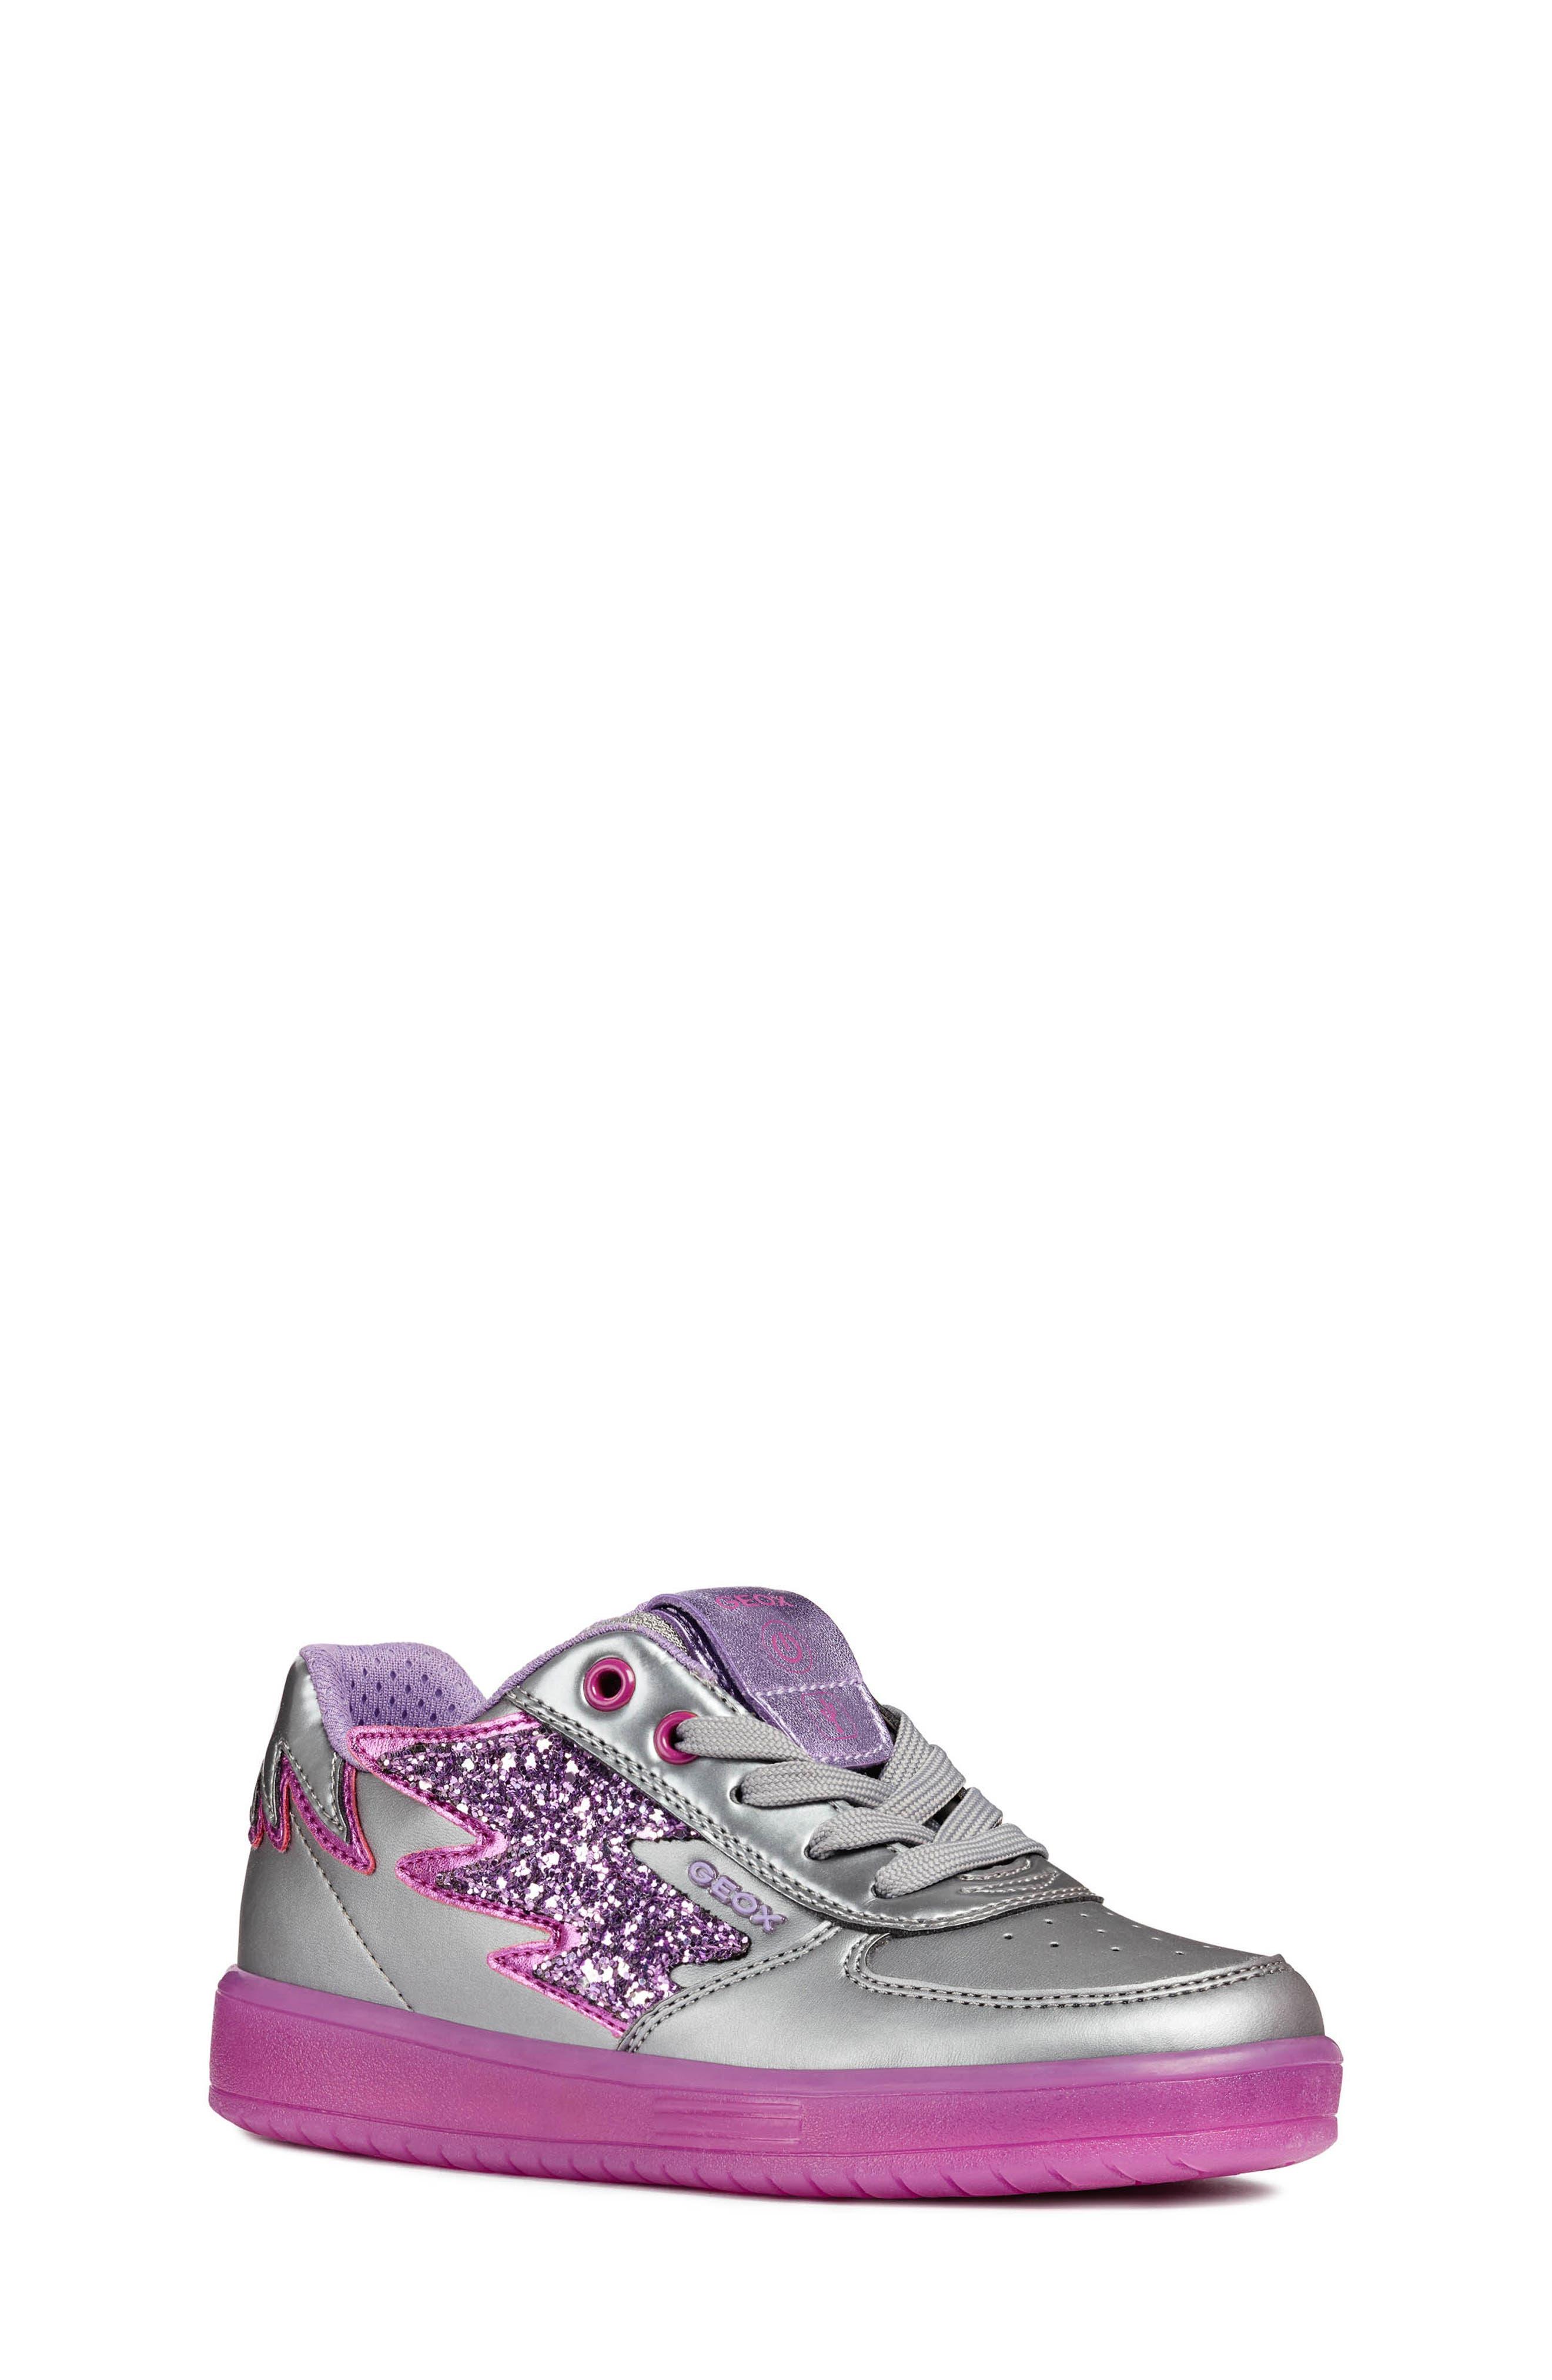 Kommodor Glitter Light Up Sneaker,                             Main thumbnail 1, color,                             DARK SILVER/LILAC